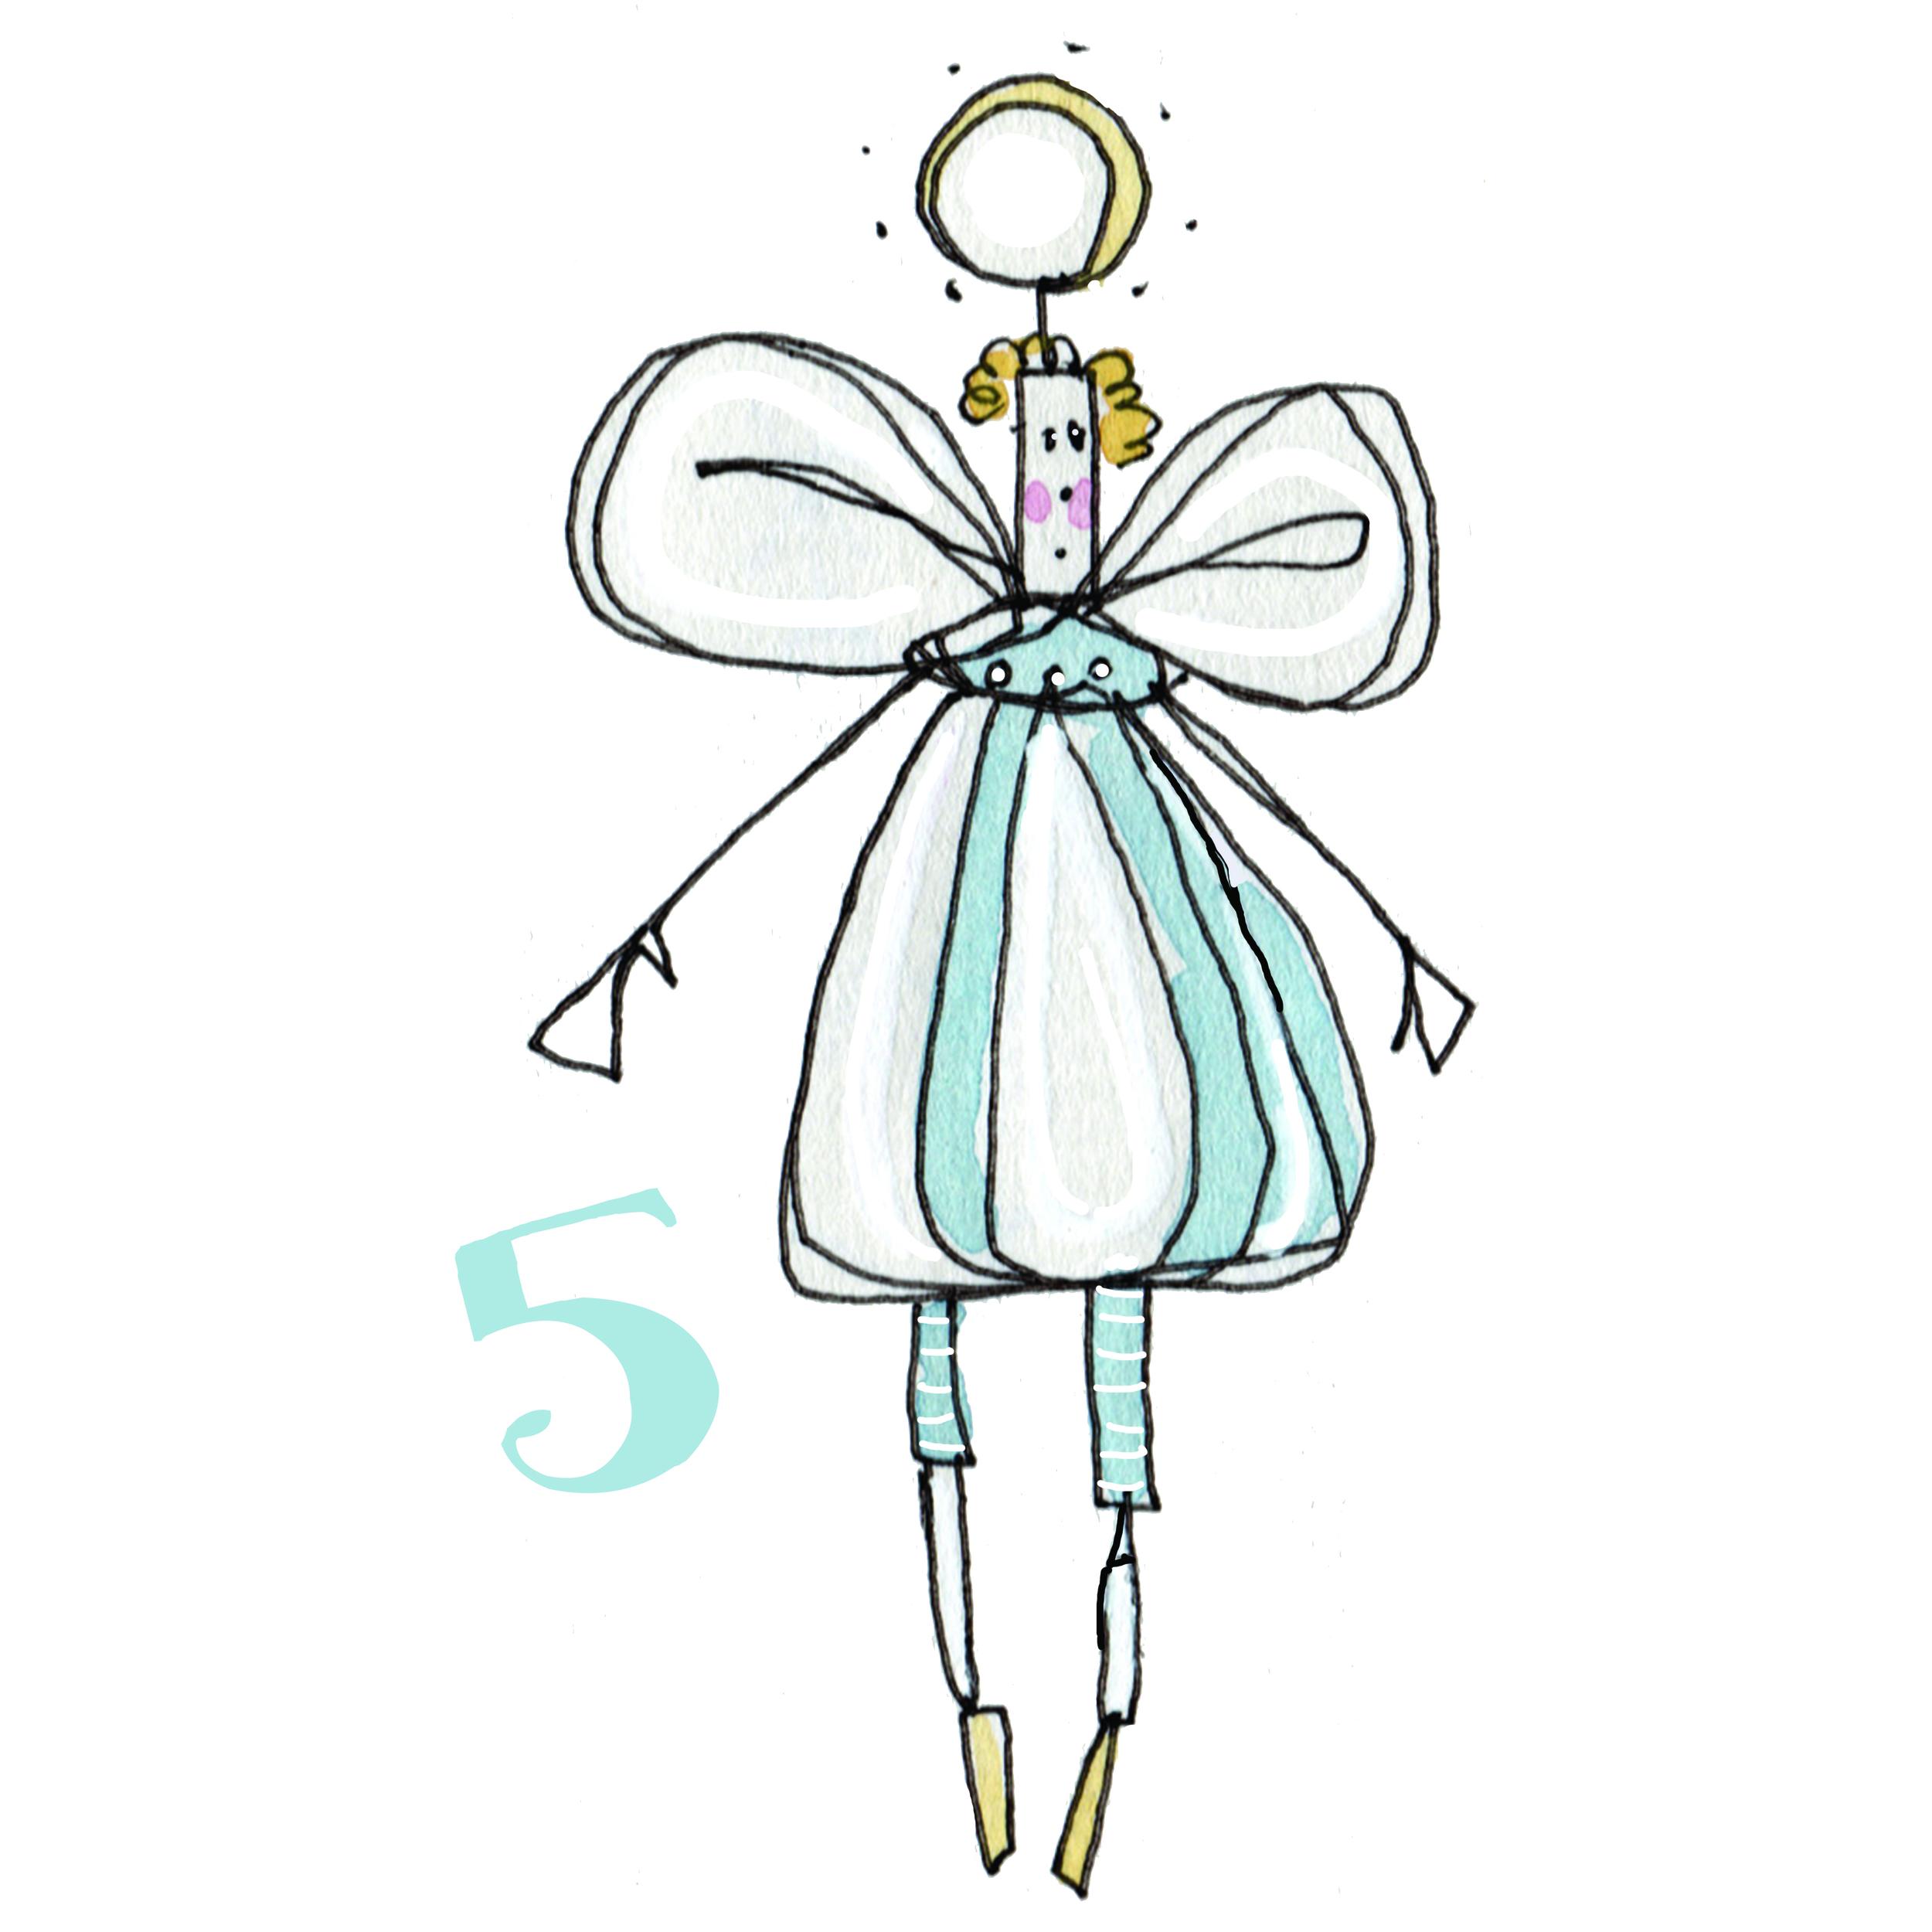 advent doodle 5.jpg